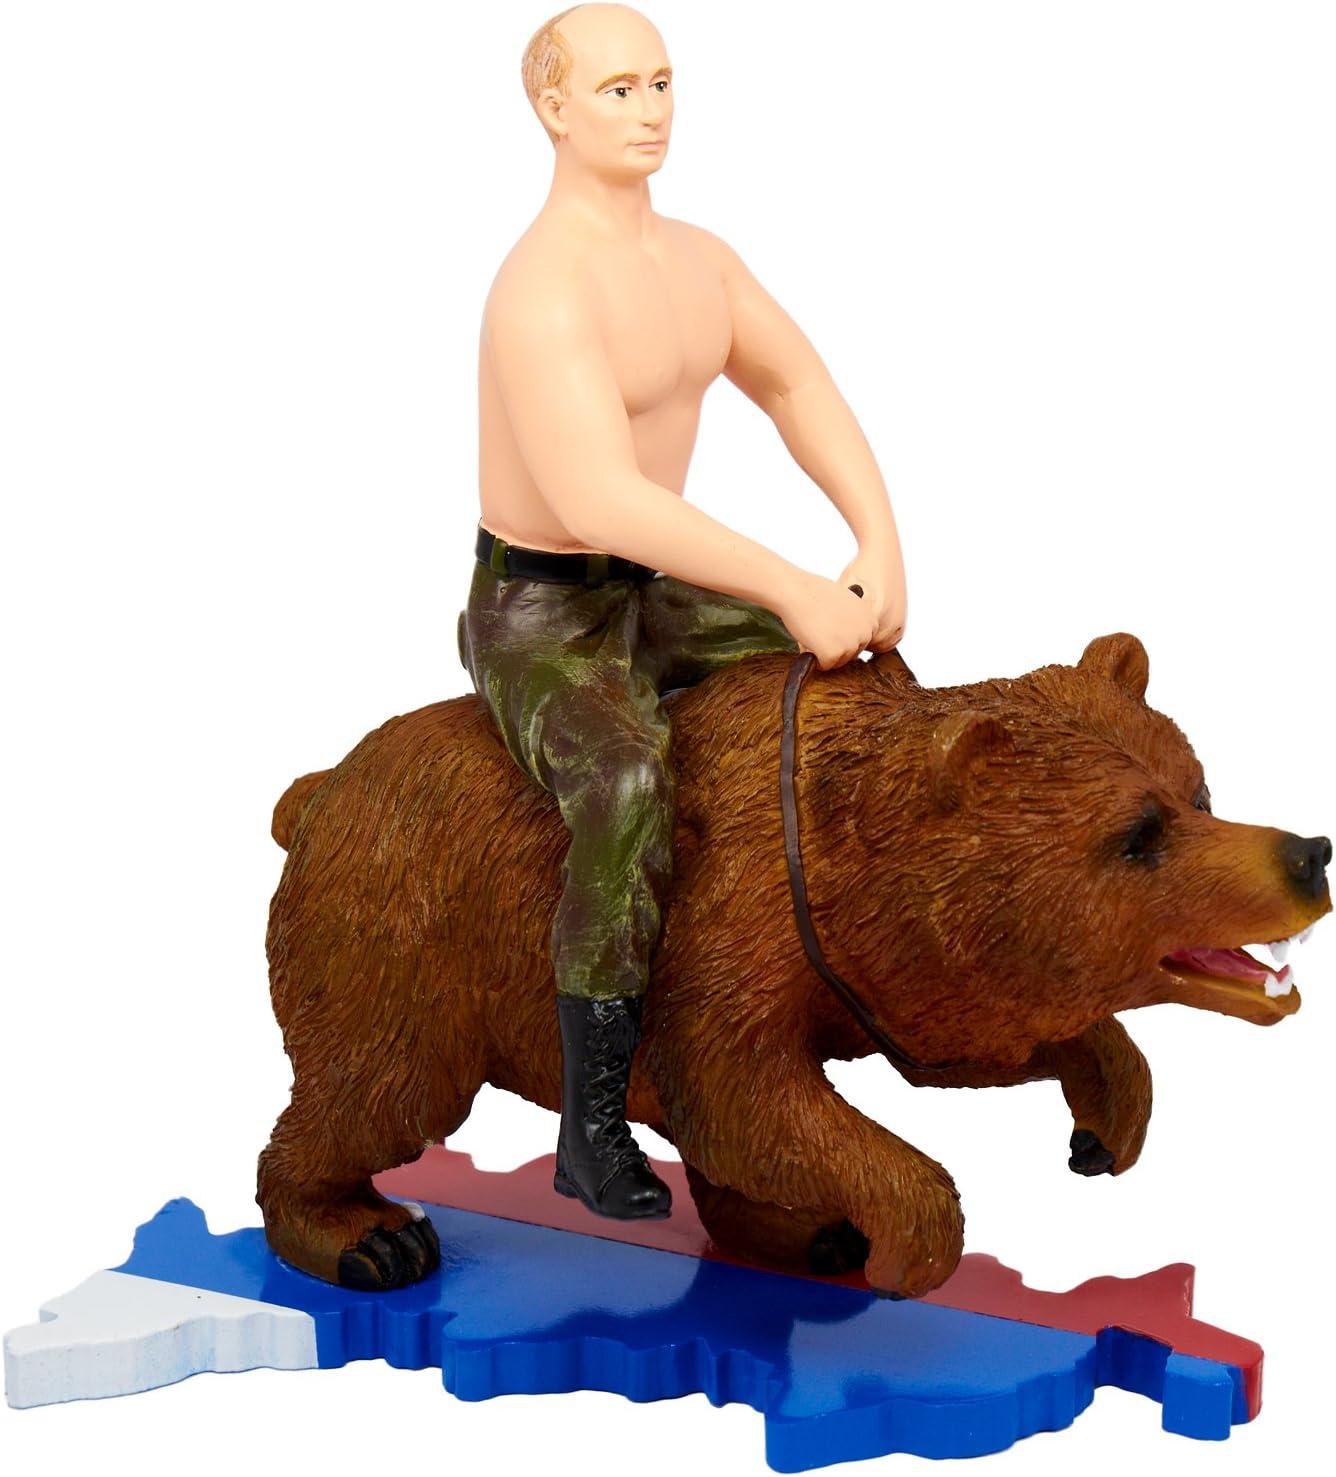 Putin Riding On A Bear Action Figure Amazon Co Uk Toys Games